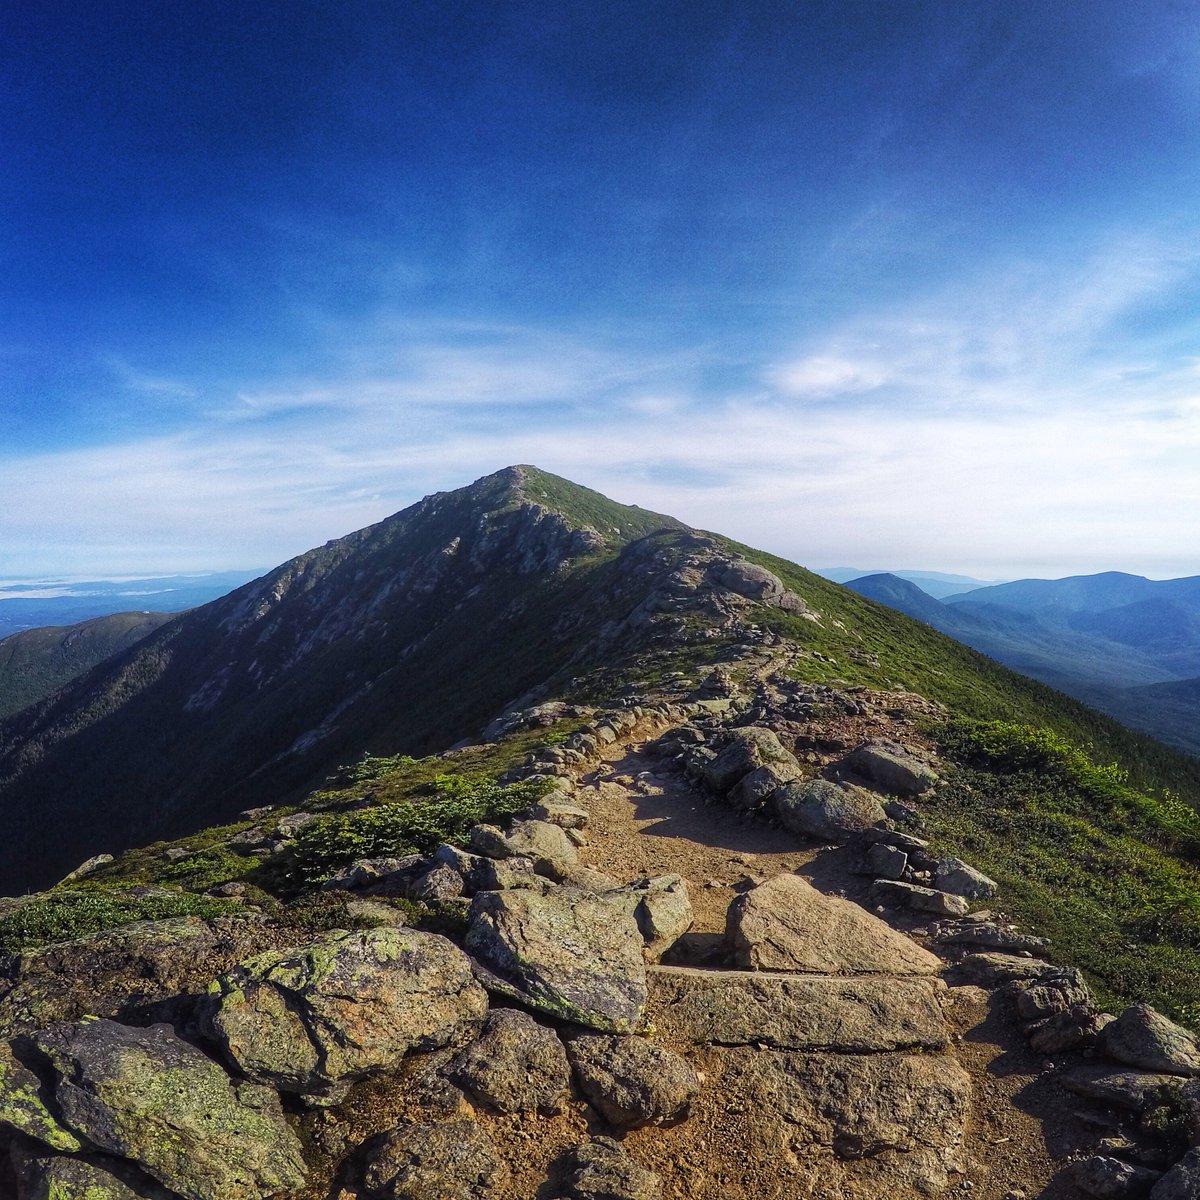 It's a long trip but hiking along the Franconia Ridge Trail NH has stunning views PC: IG's dirigoendurance. #goEast https://t.co/jVTBmrR1UZ